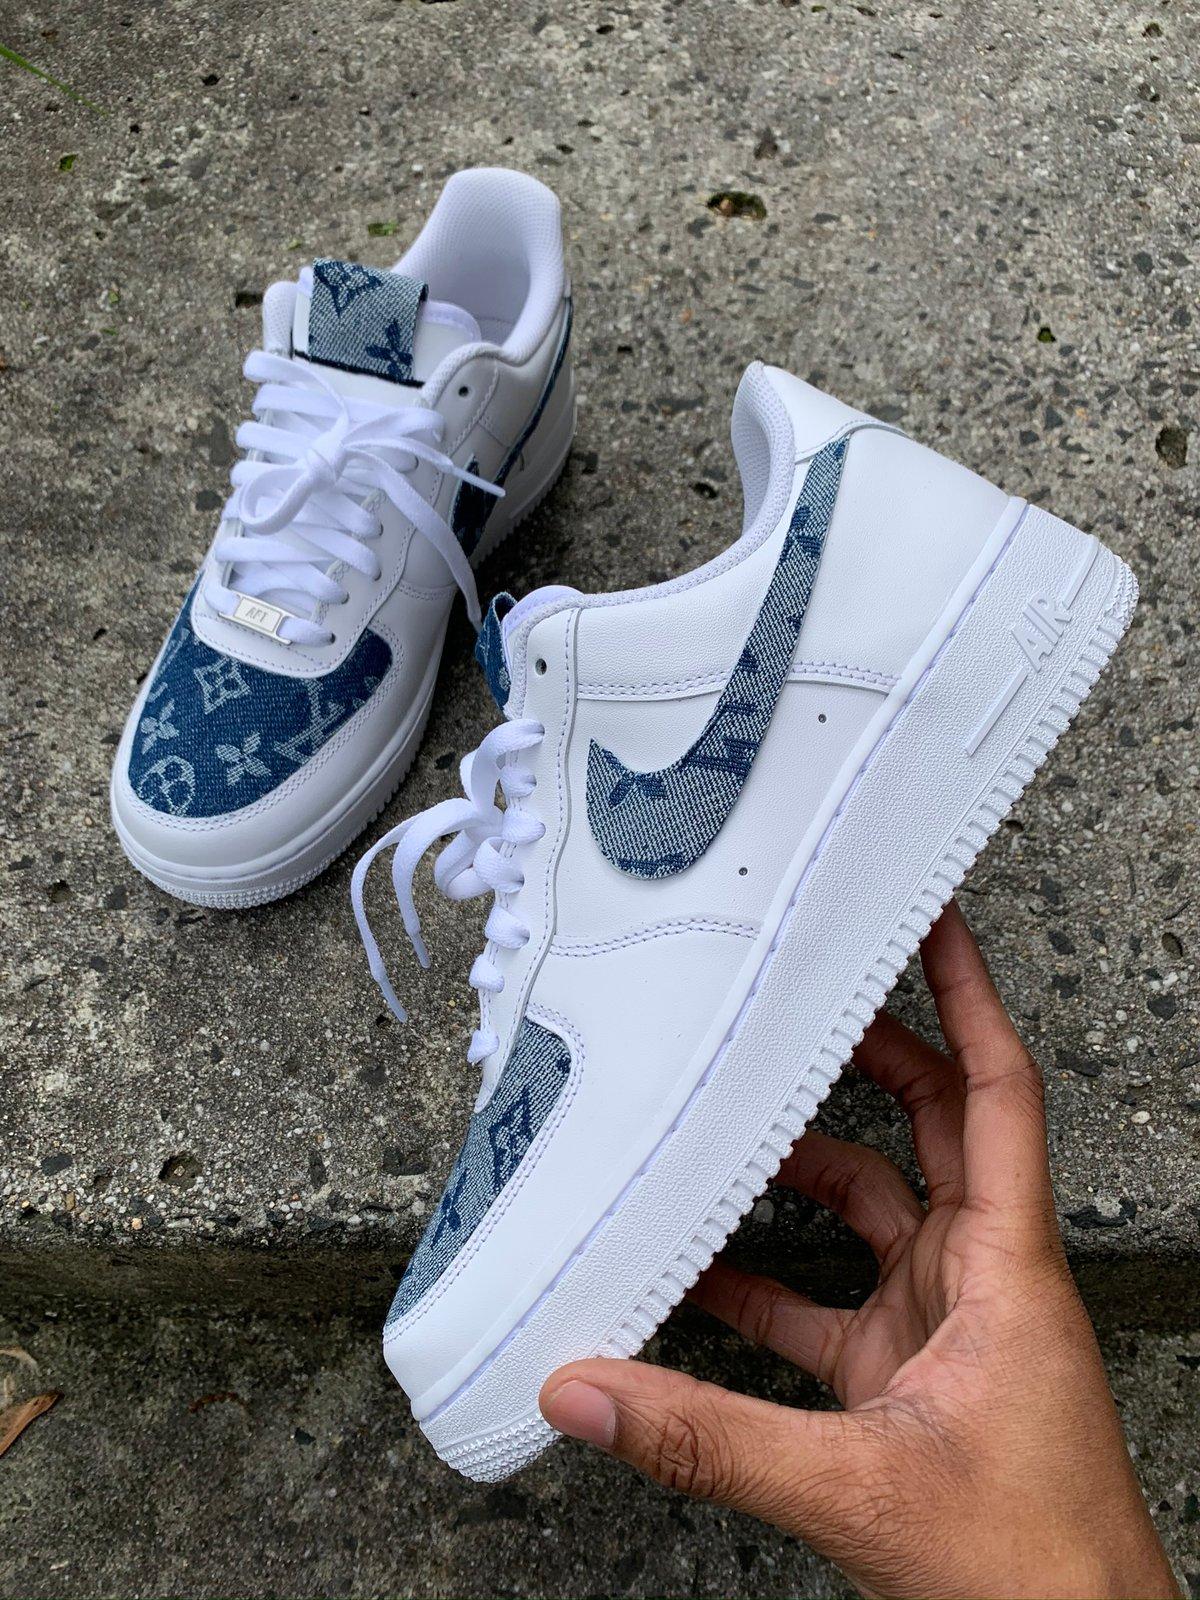 blue louis vuitton air force ones